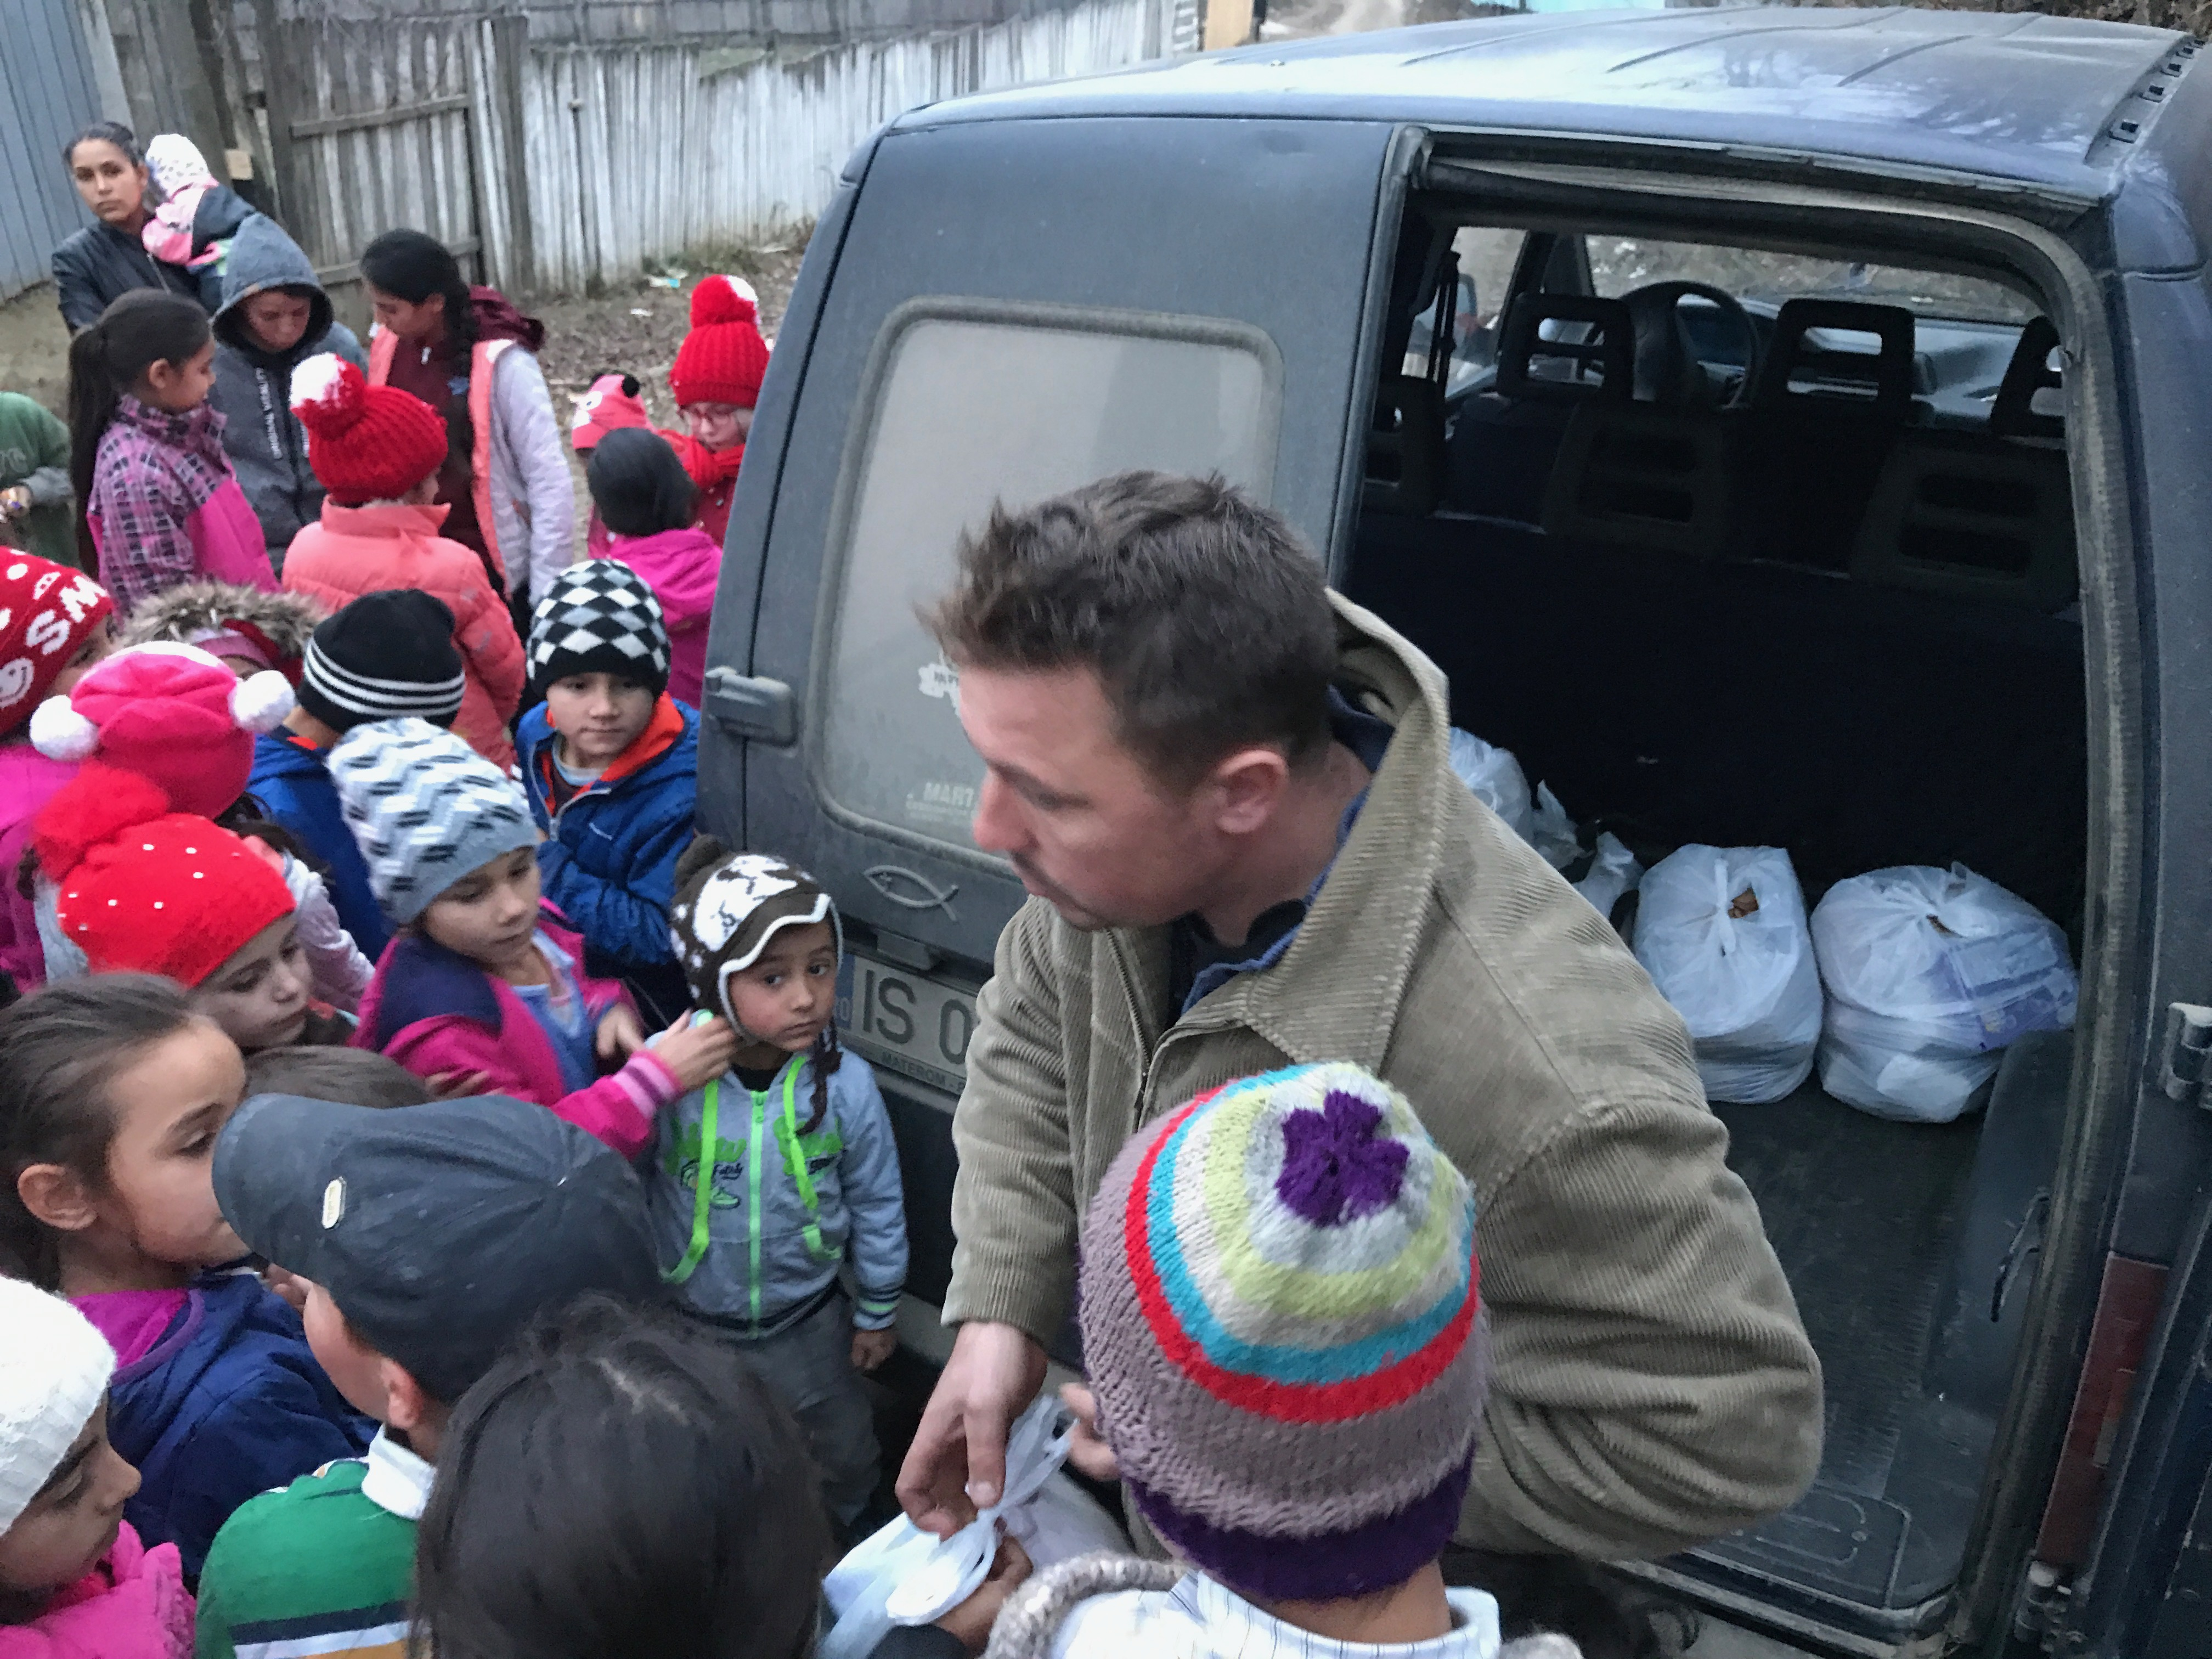 Nicu Stroi si occupa di distribuire i pacchi alimentari alle 23 famiglie